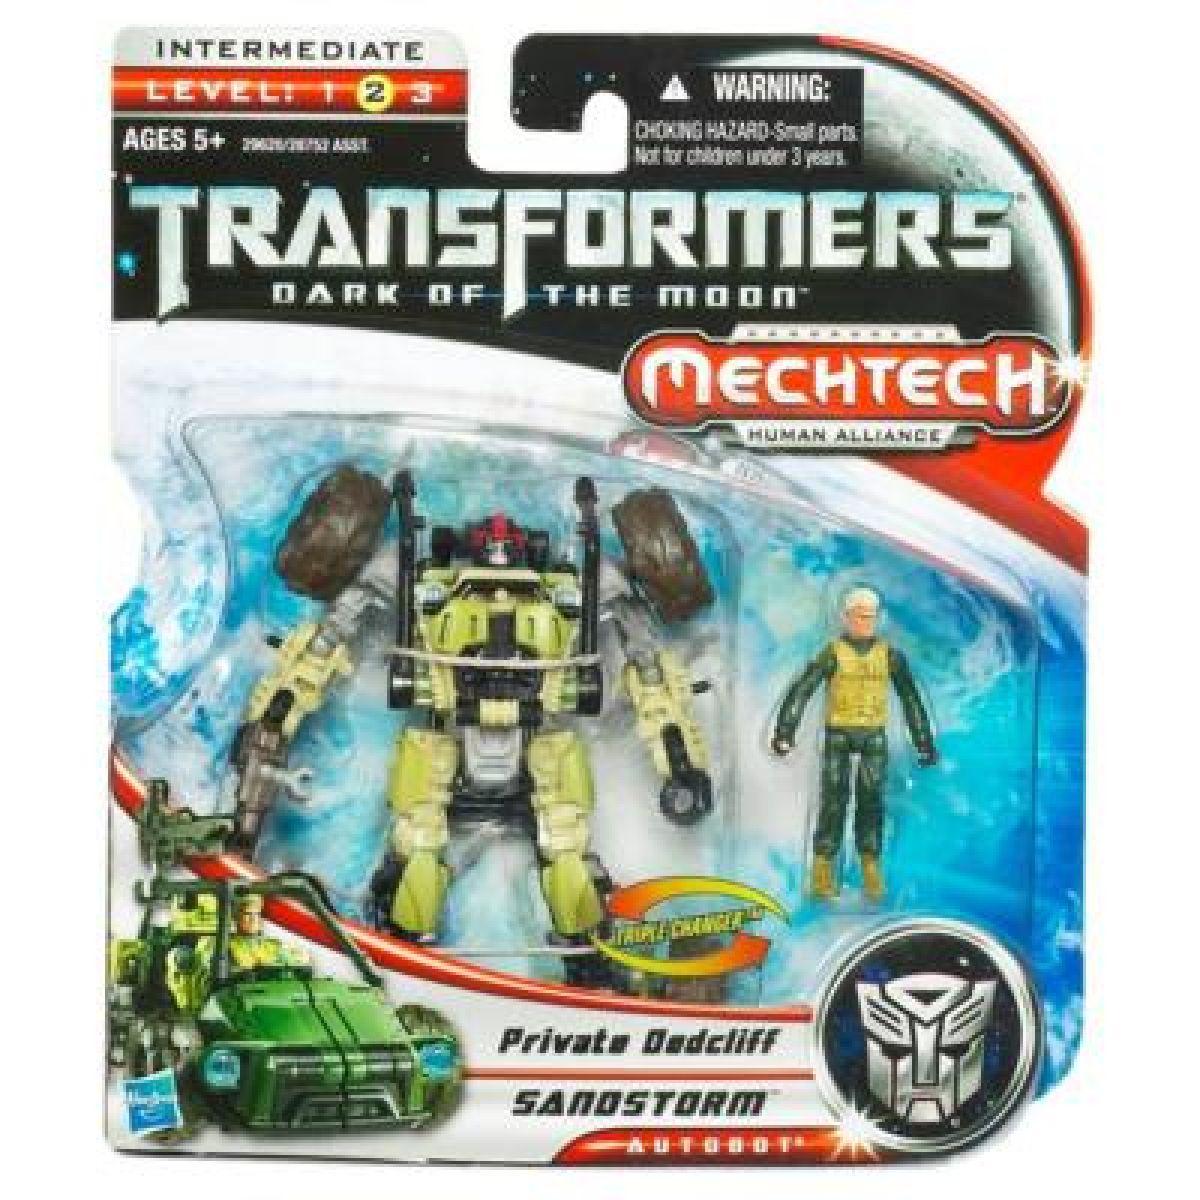 Transformers human alliance základní figurka Hasbro 28752 - Spike Witwicky a BackFire